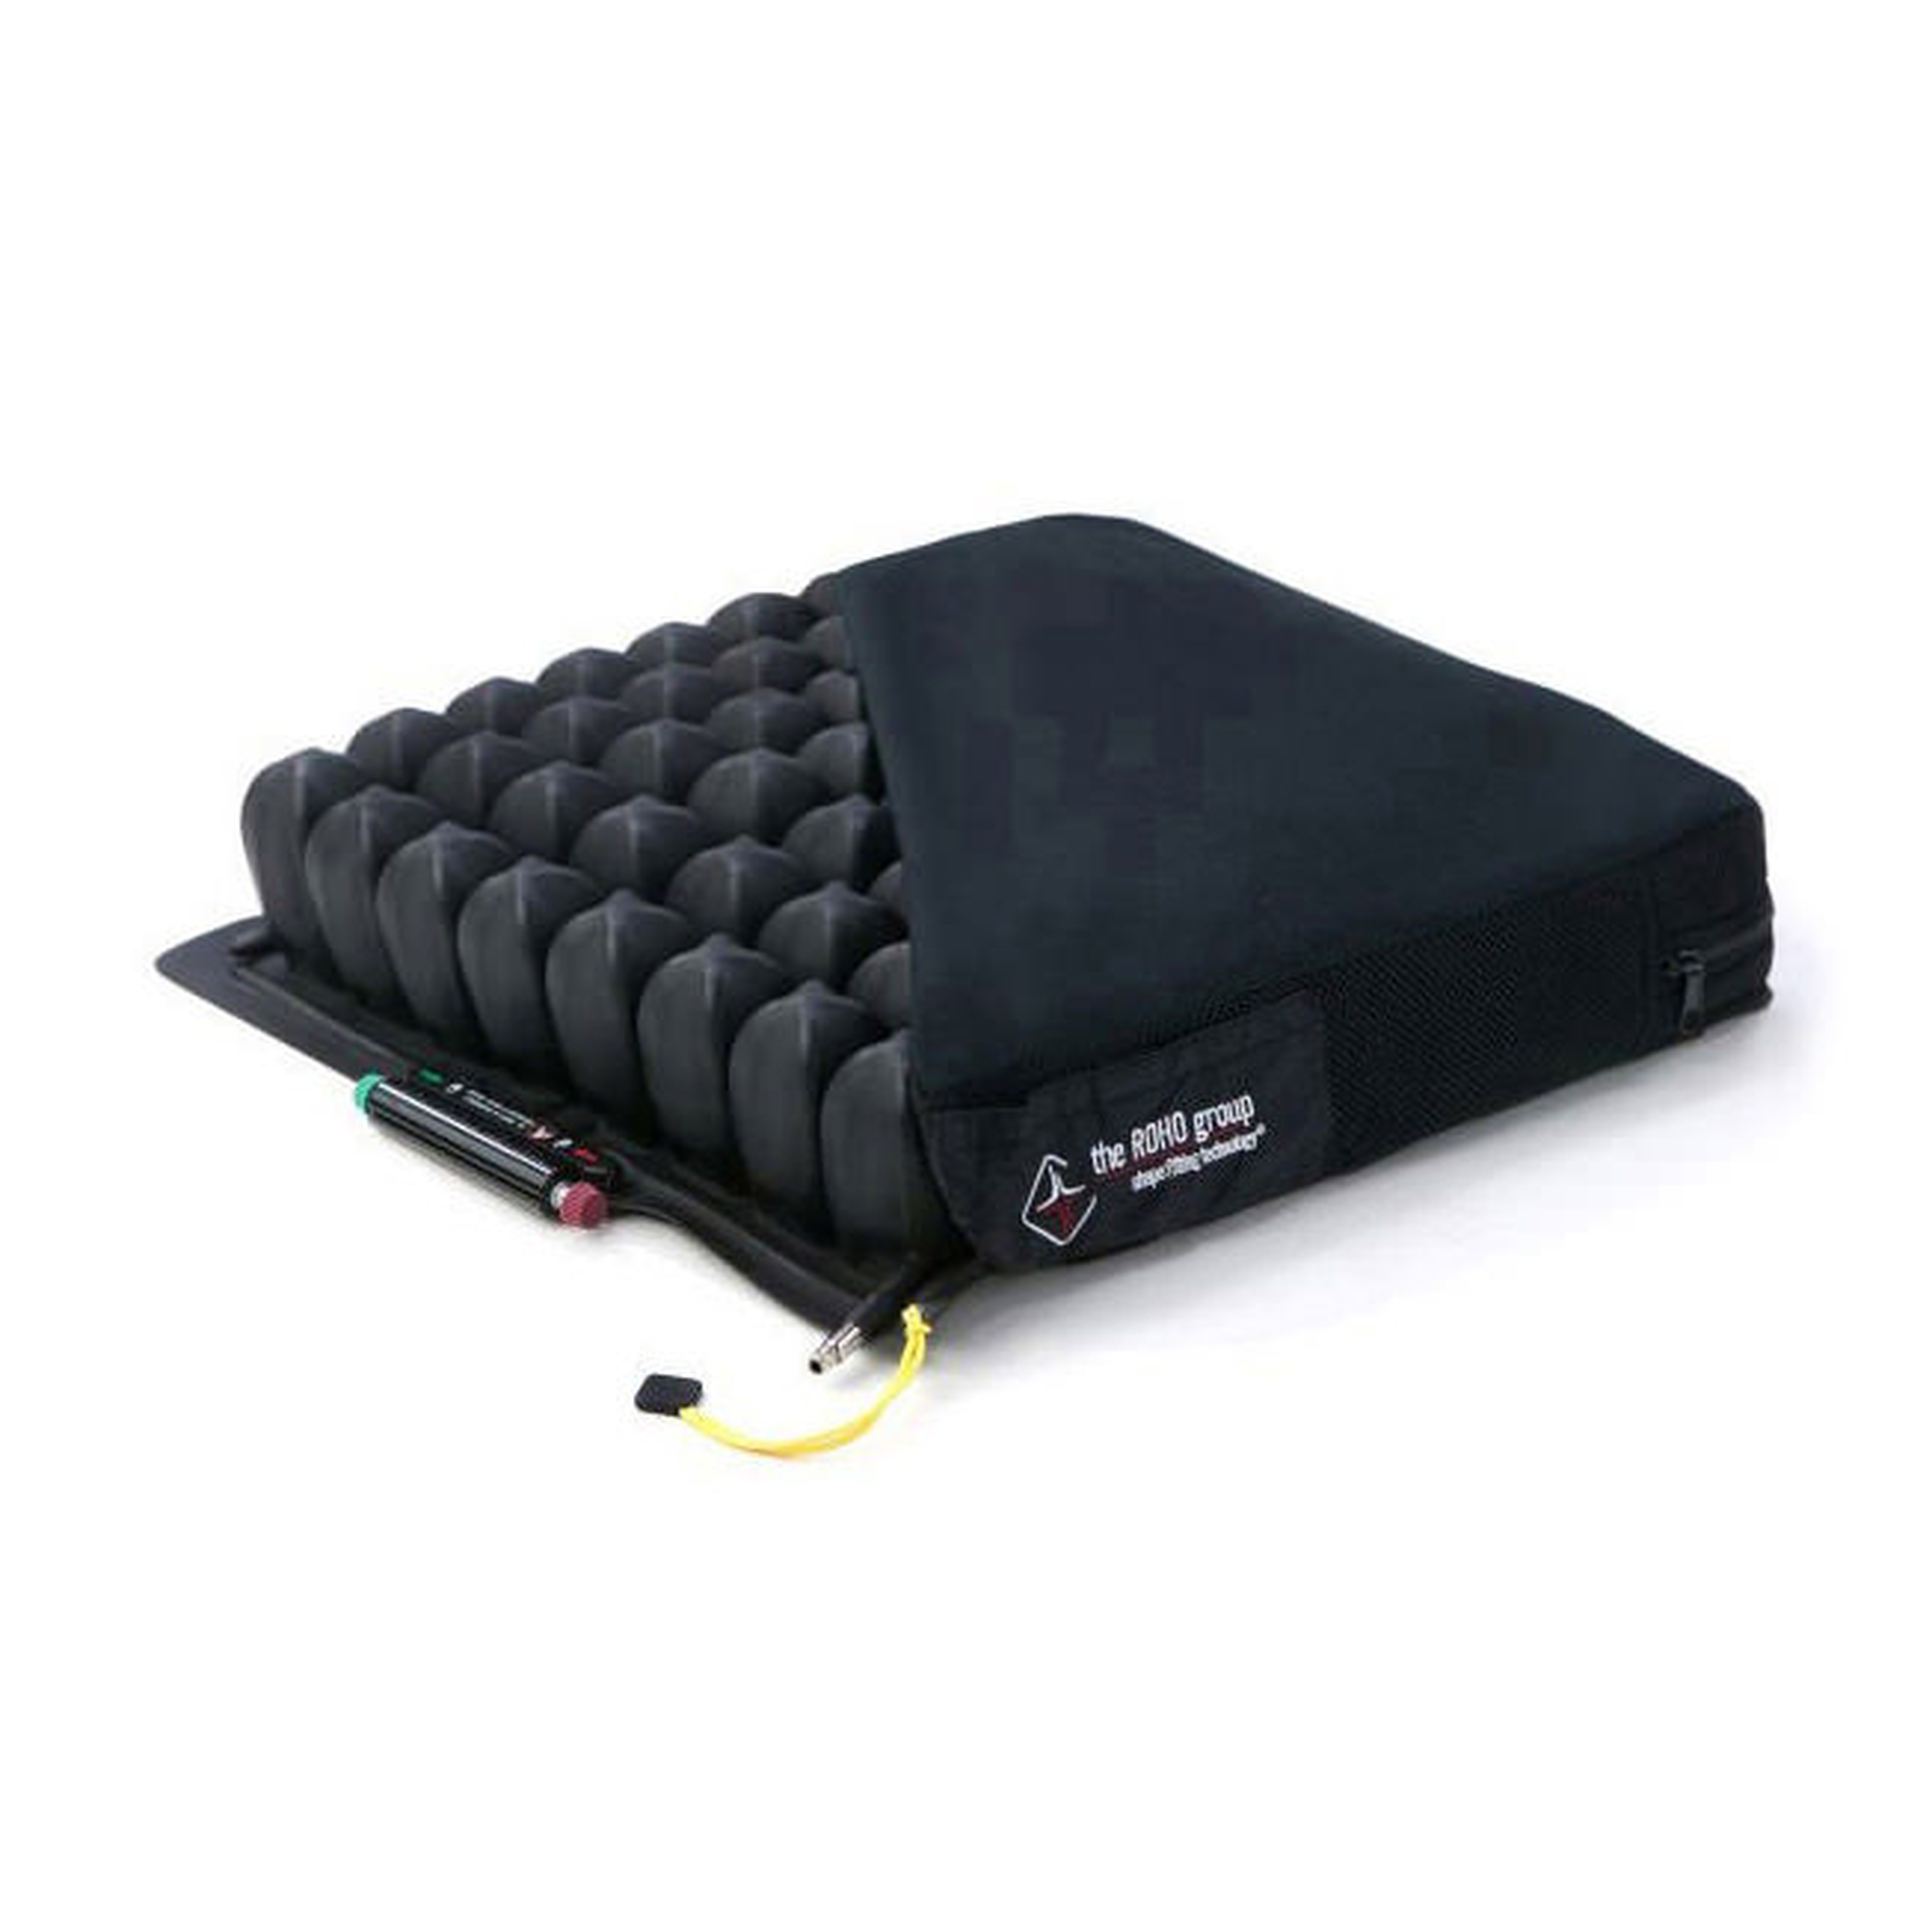 Roho Quadtro select mid profile cushion with cover